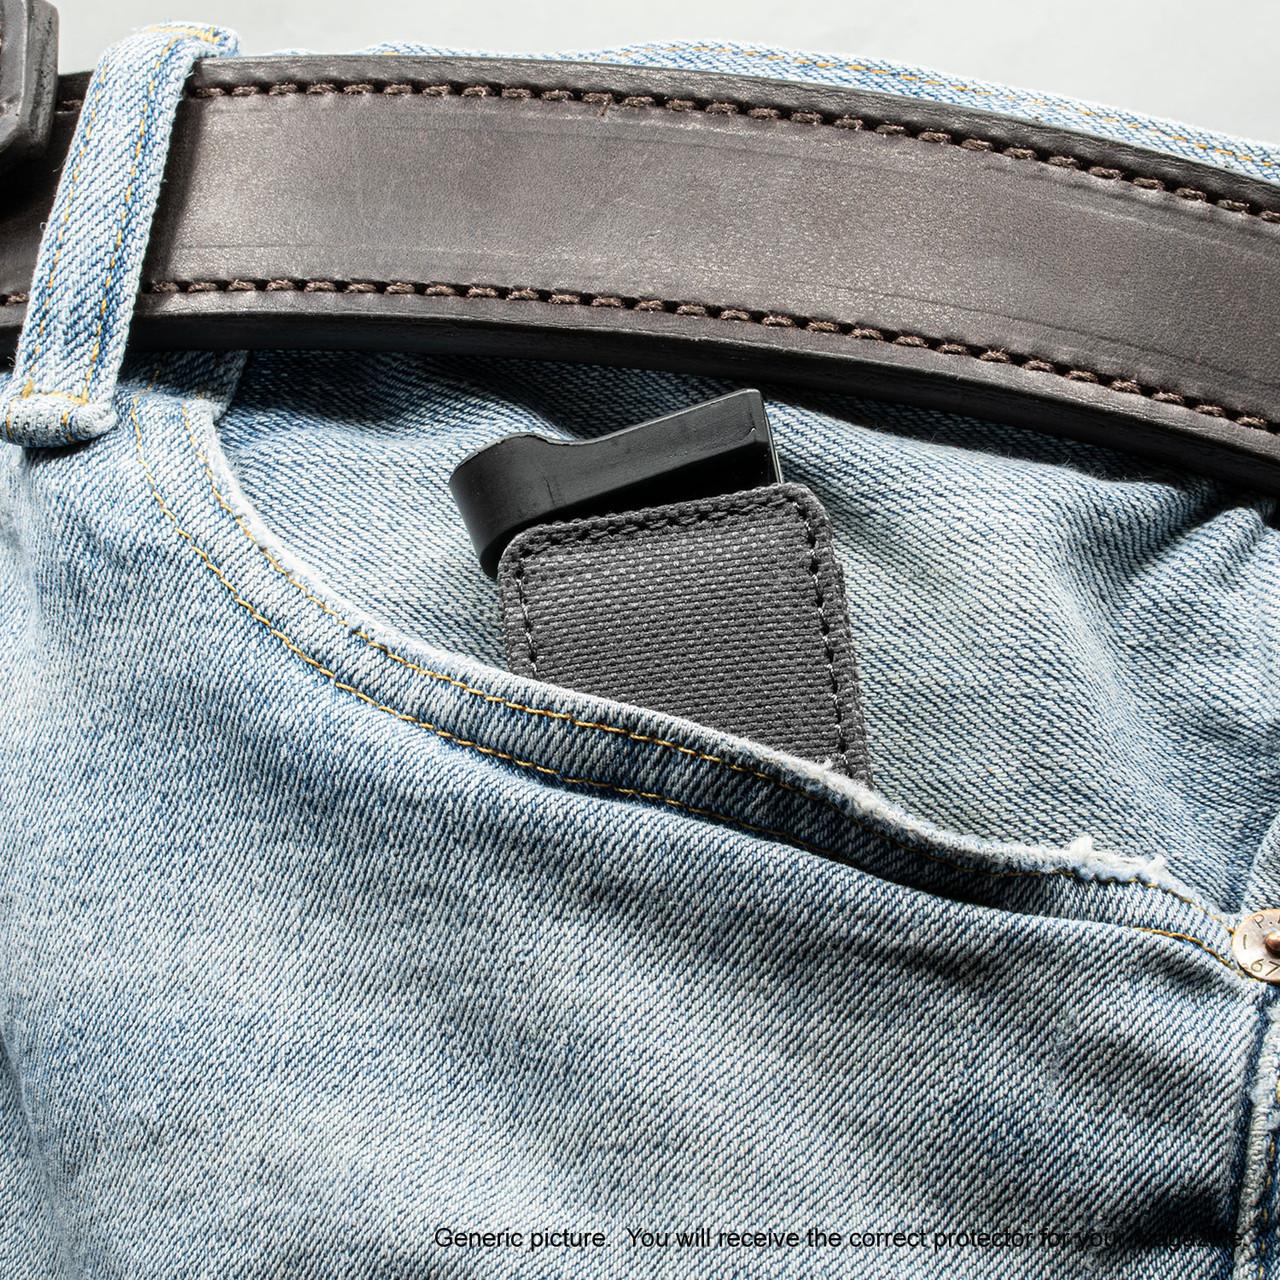 Sphinx SDP Compact Grey Covert Magazine Pocket Protector